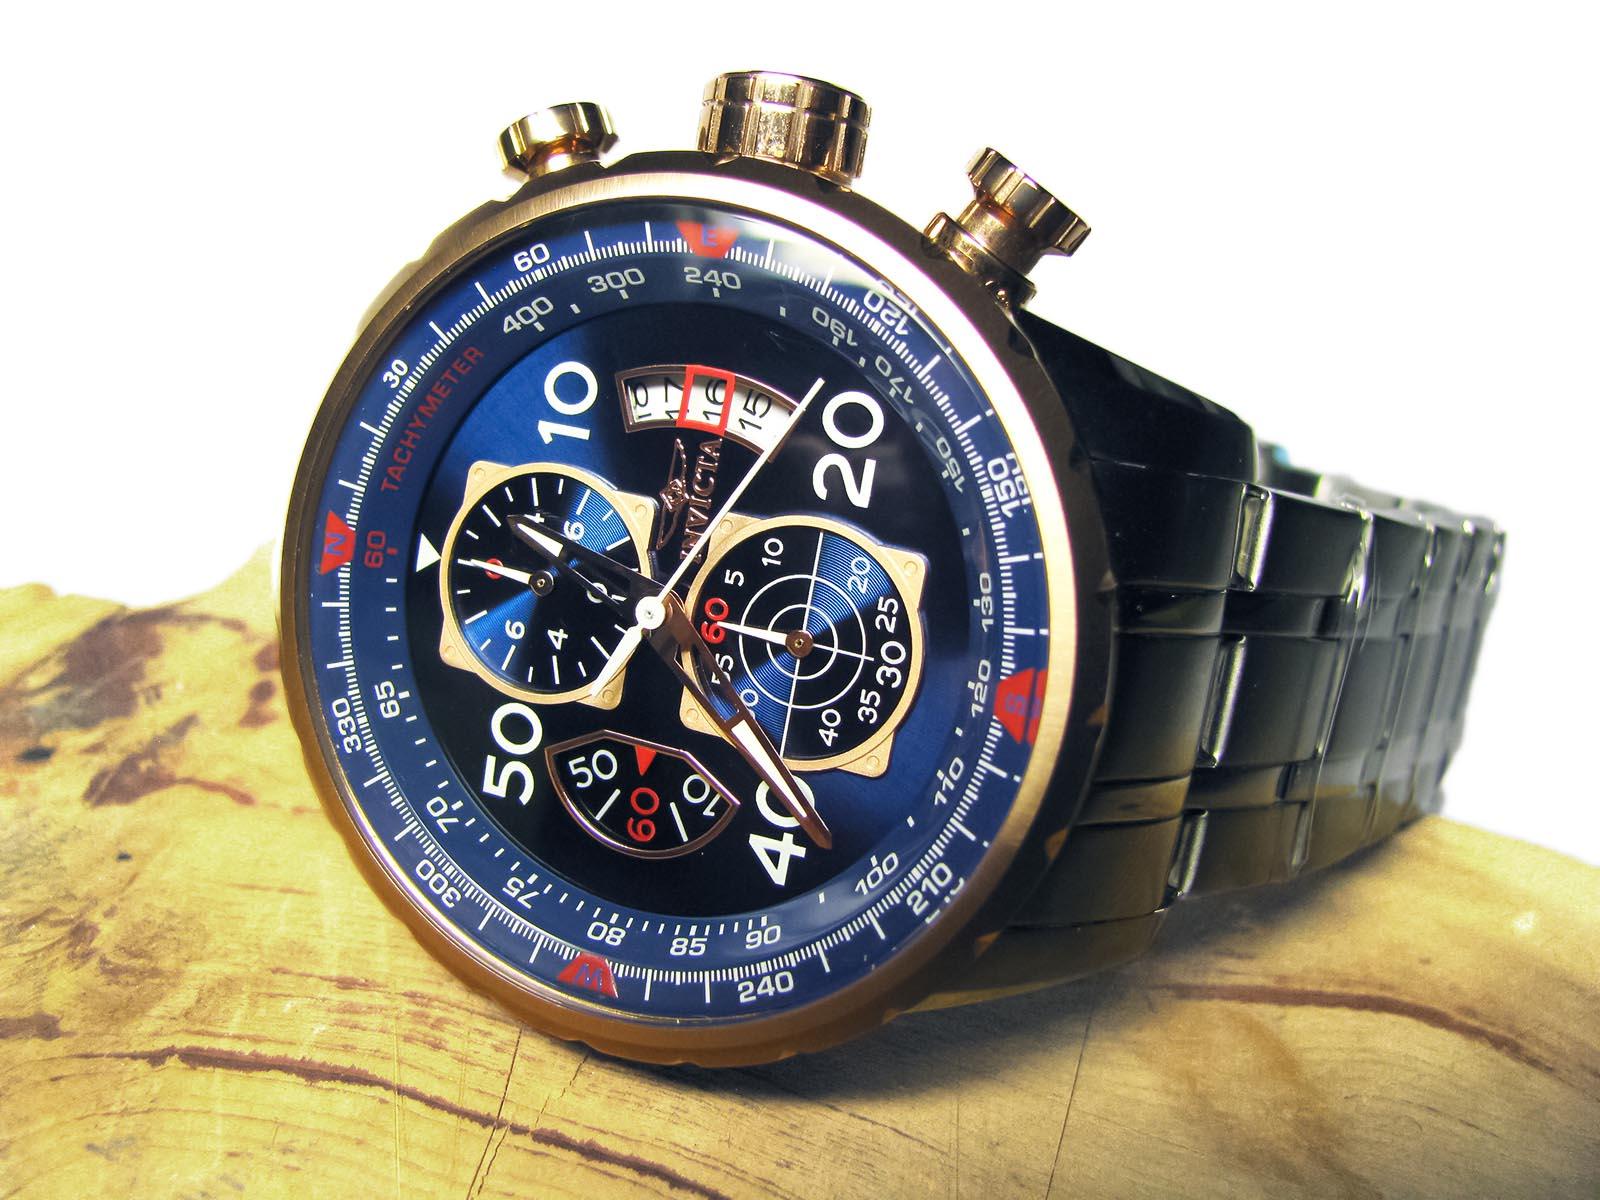 Invicta 17203 AVIATOR Heavy weight watch